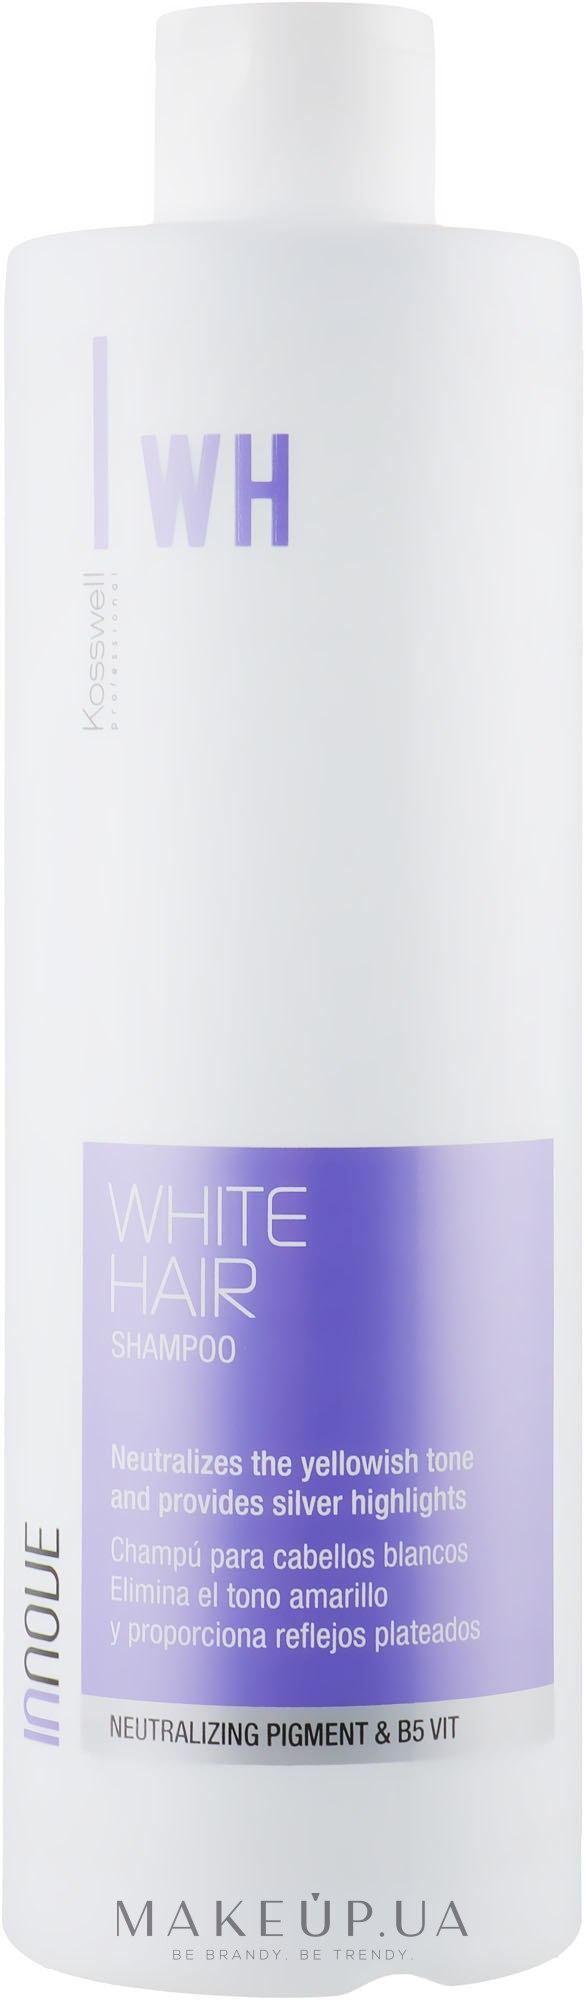 Шампунь нейтрализатор желтого оттенка - Kosswell Innove Professional White Hair Shampoo — фото 500ml